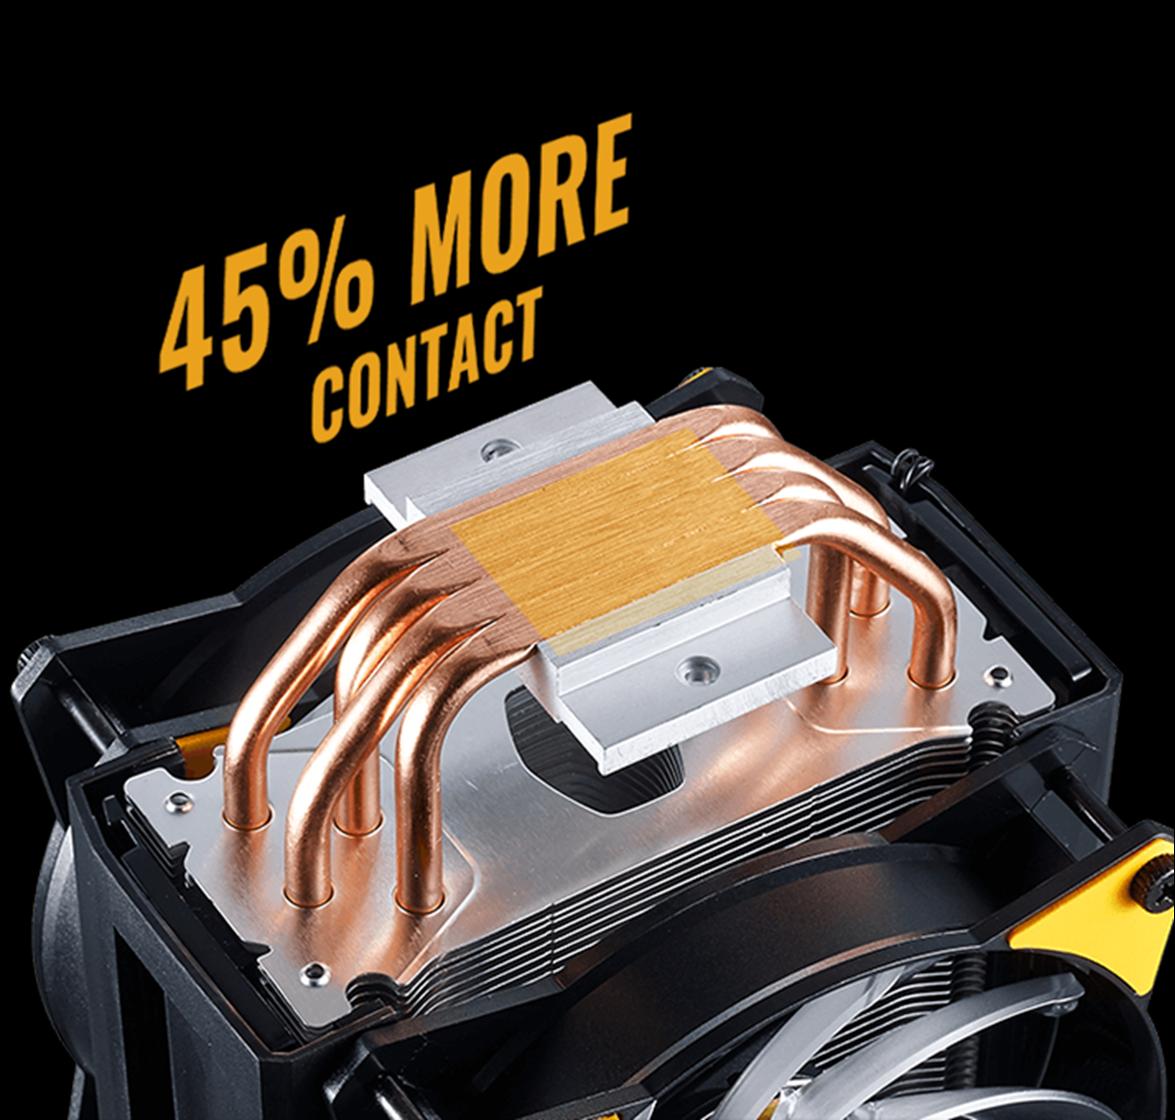 Copper Based CDC 2.0